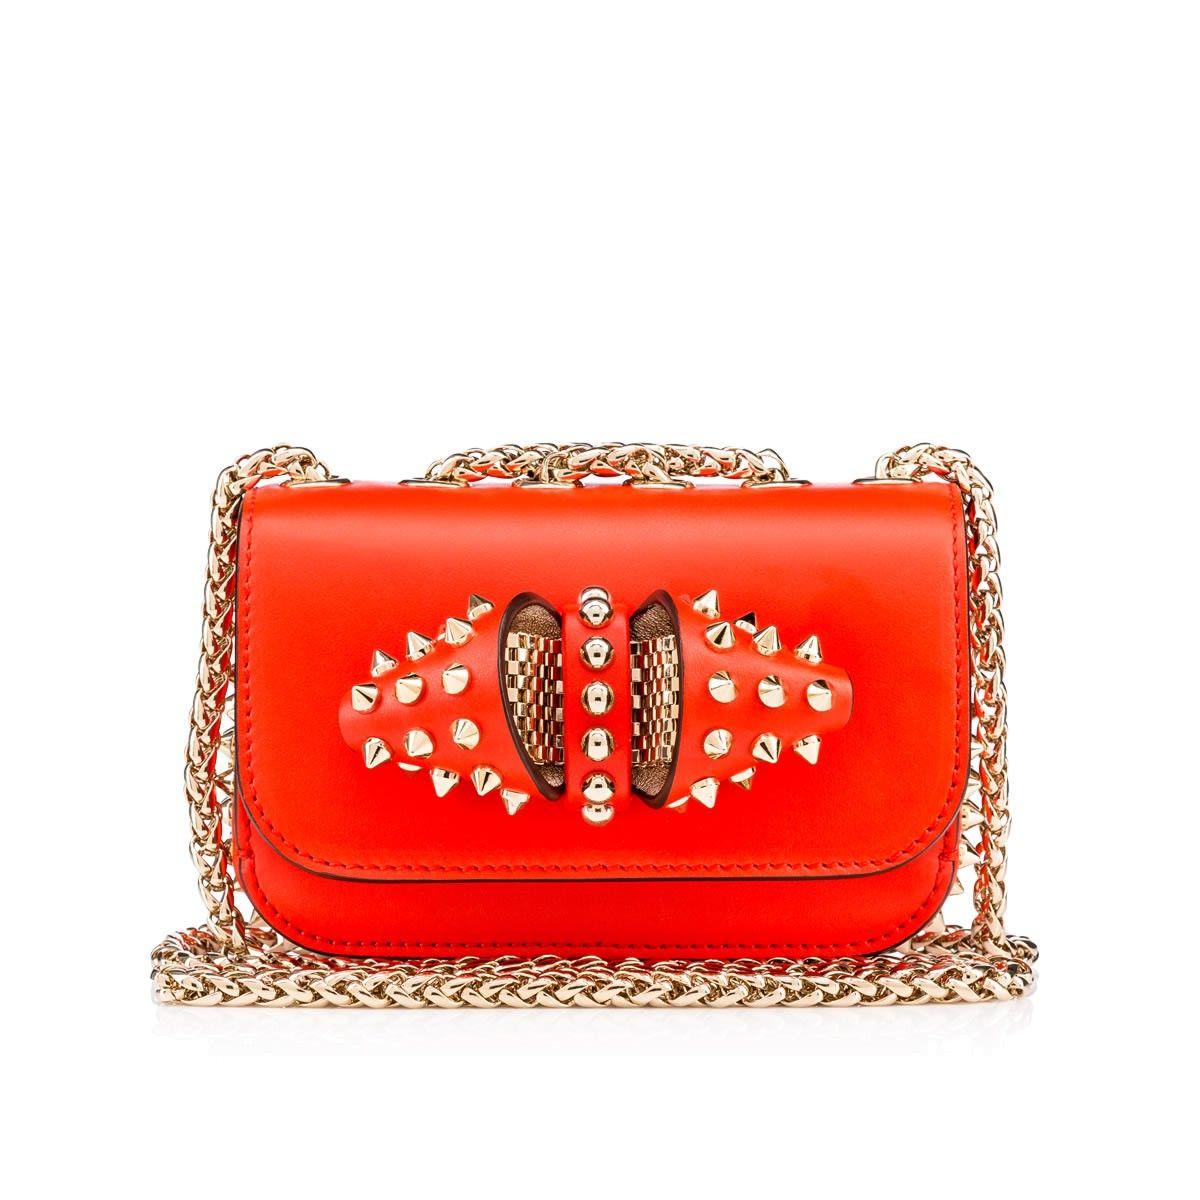 f8e475d44a1 Women Bags - Sweety Charity Mini Chain Bag - Christian Louboutin ...